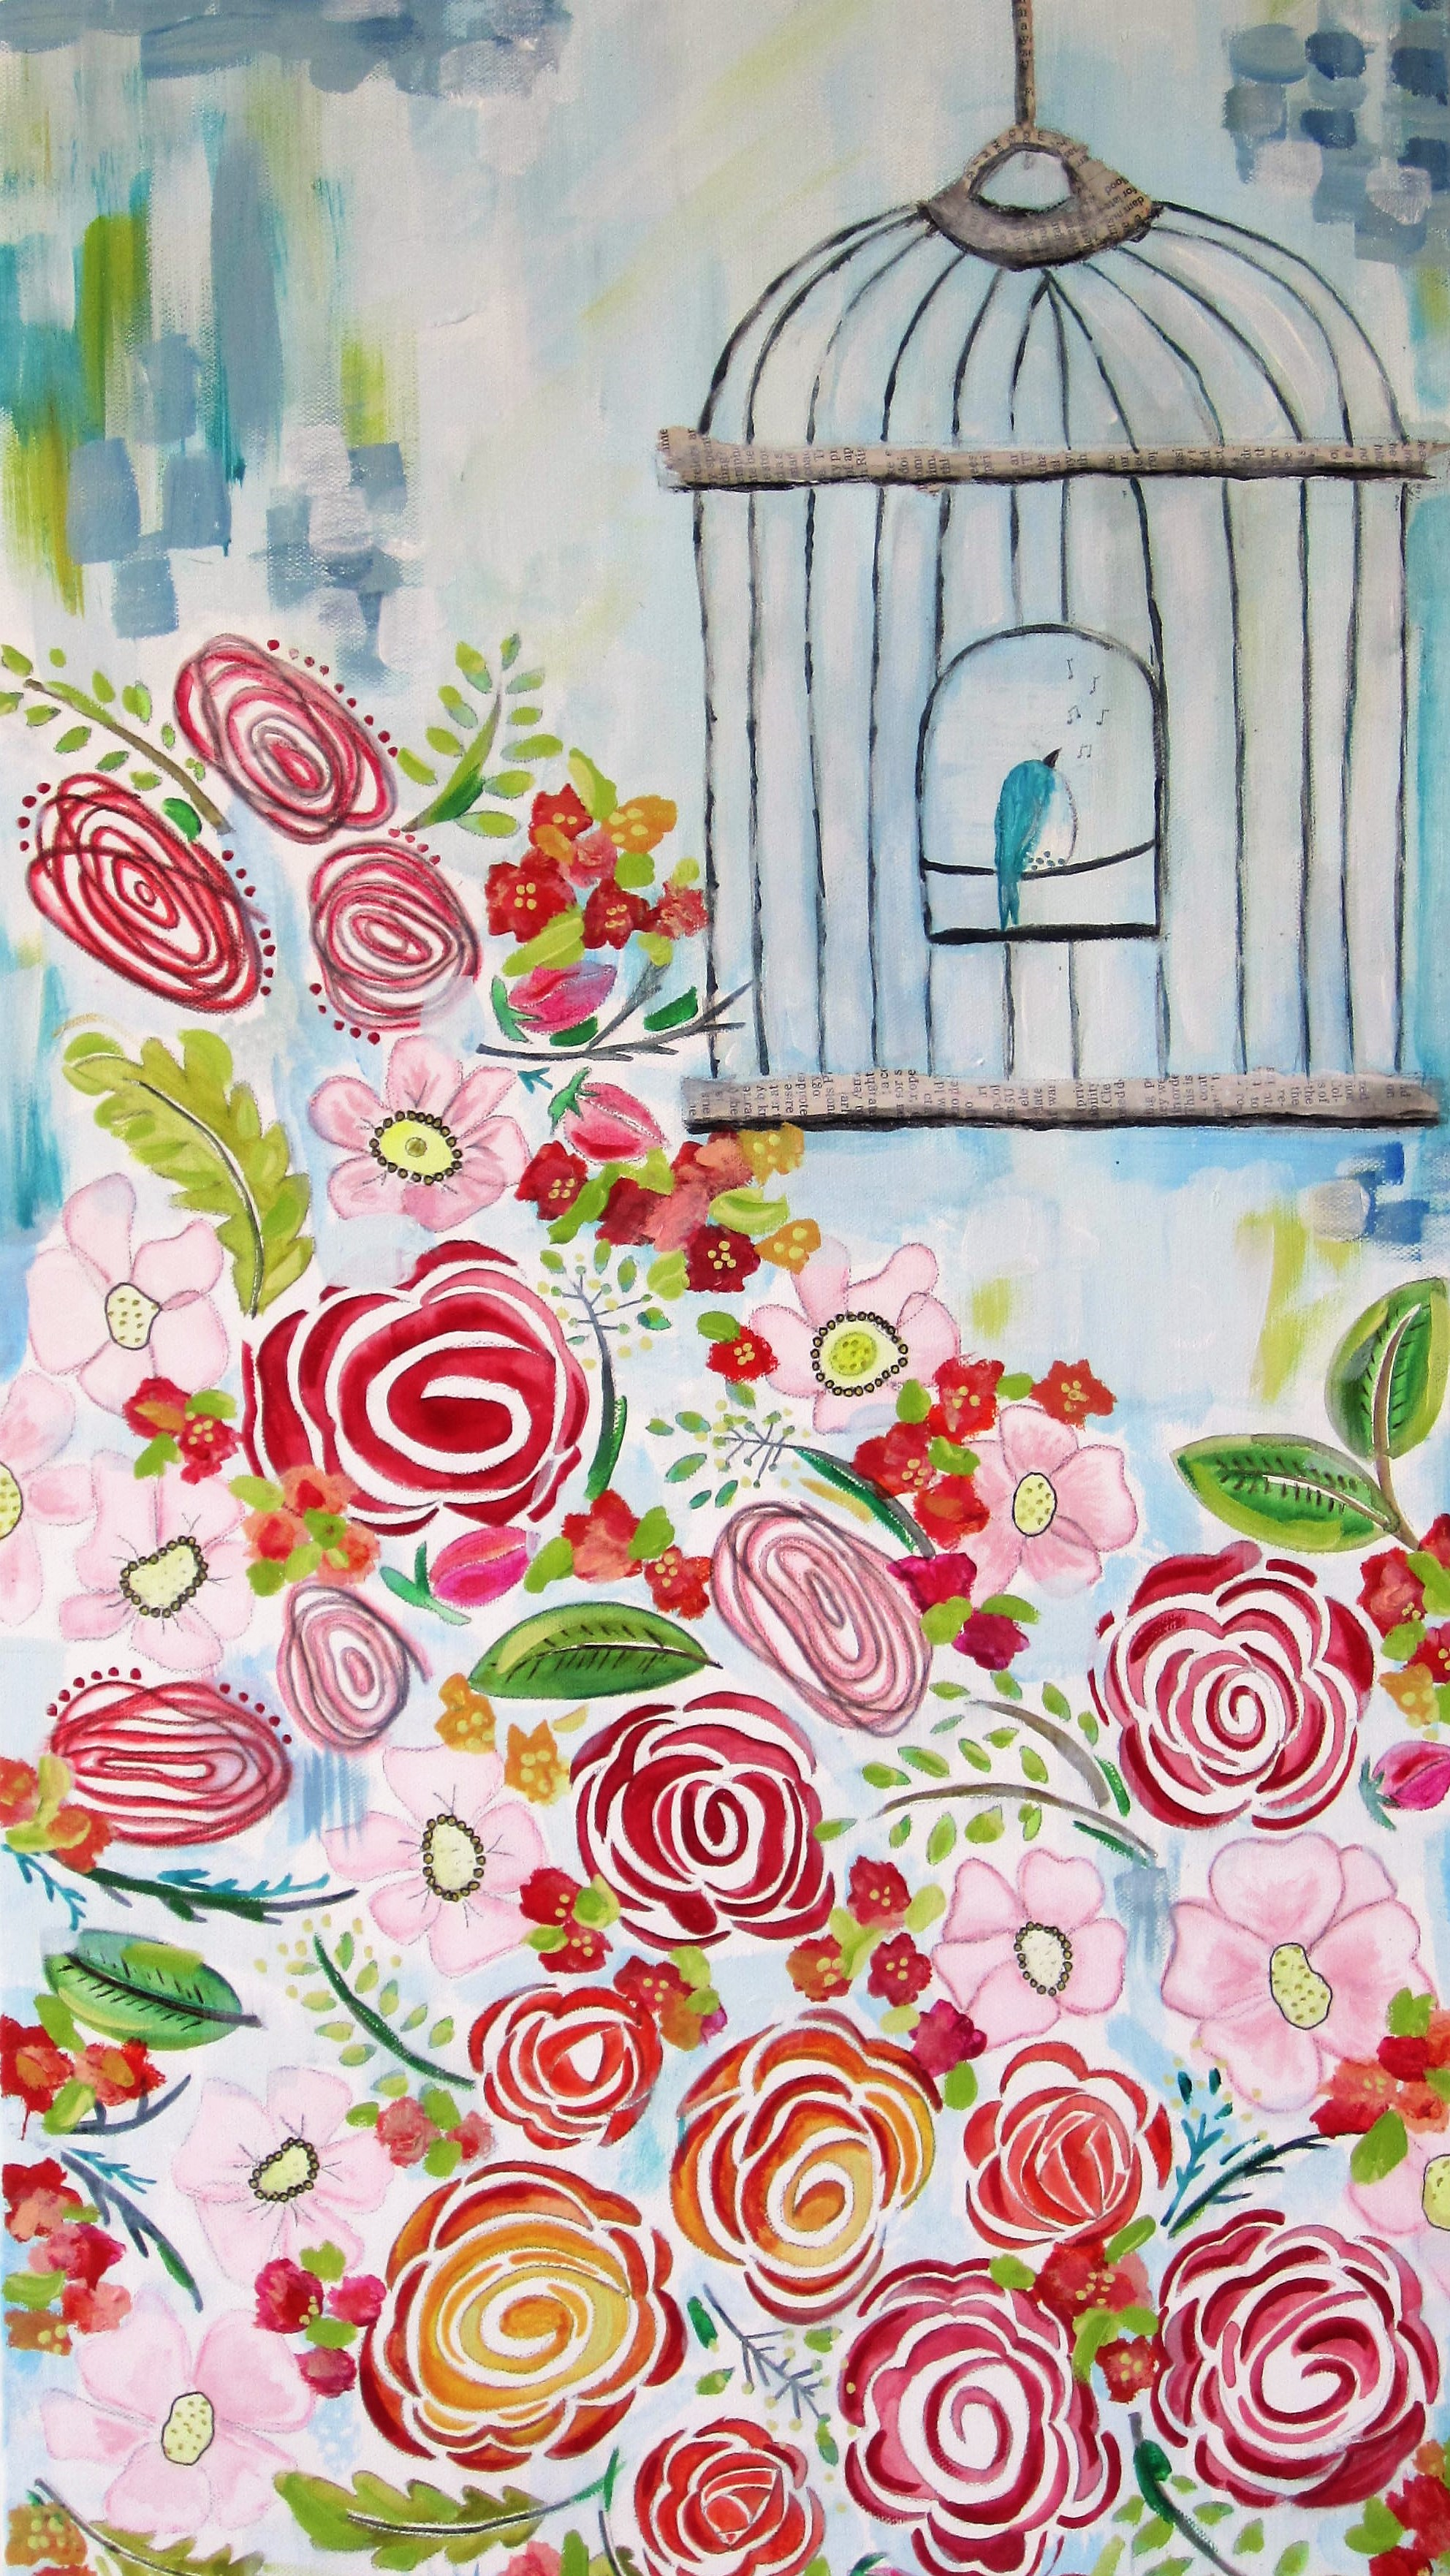 Rose Garden-SOLD